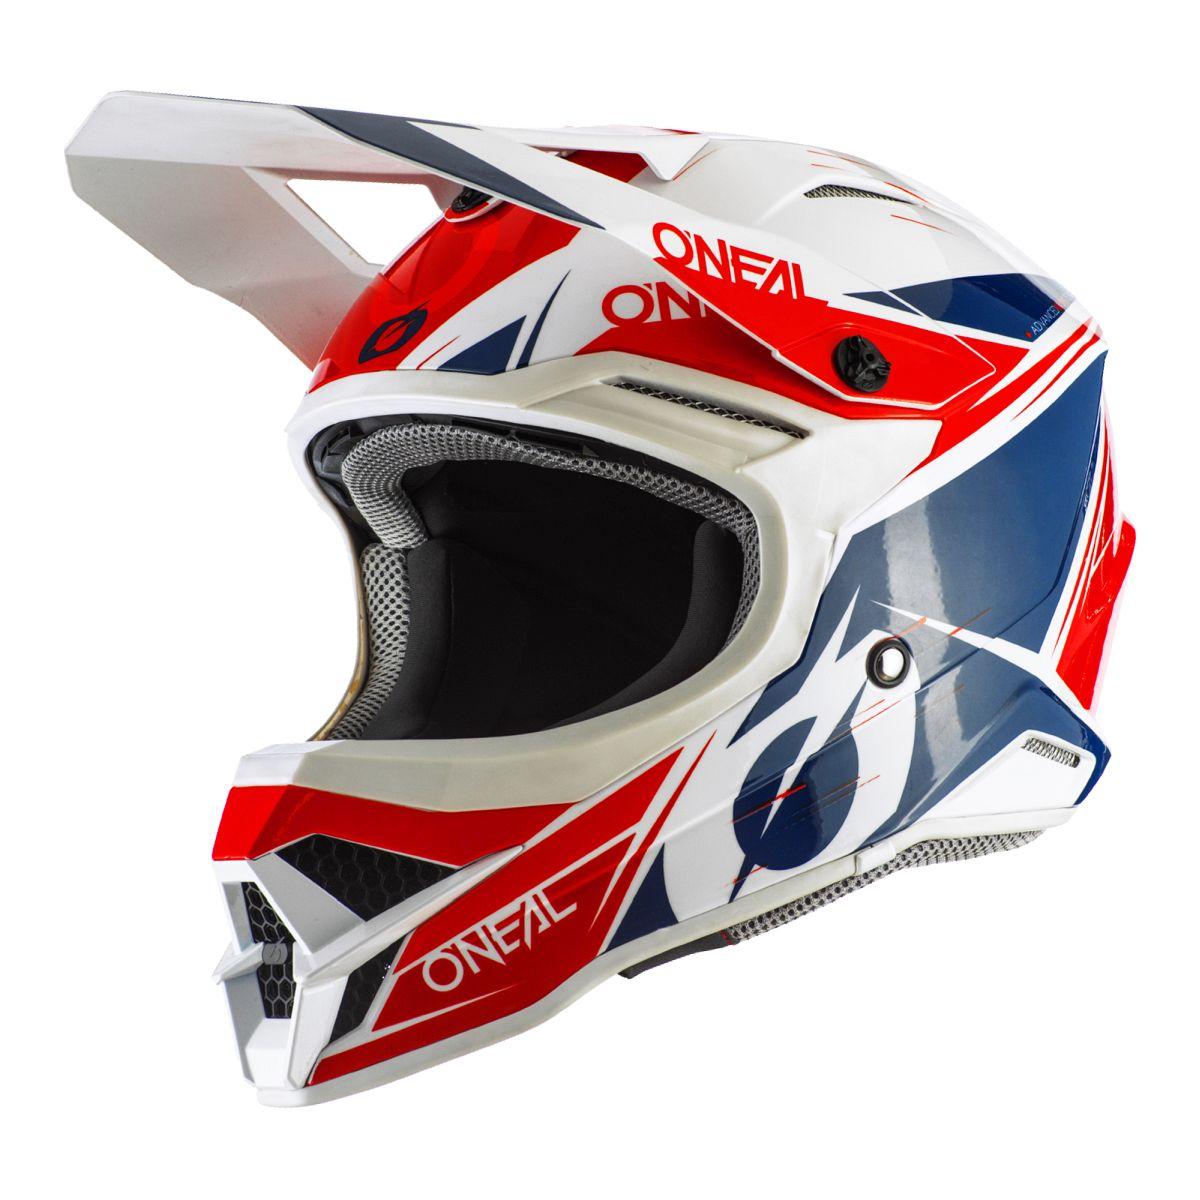 ONEAL 3 Series Stardust Motocross Enduro MTB Helm wei/ß//rot//blau 2021 Oneal